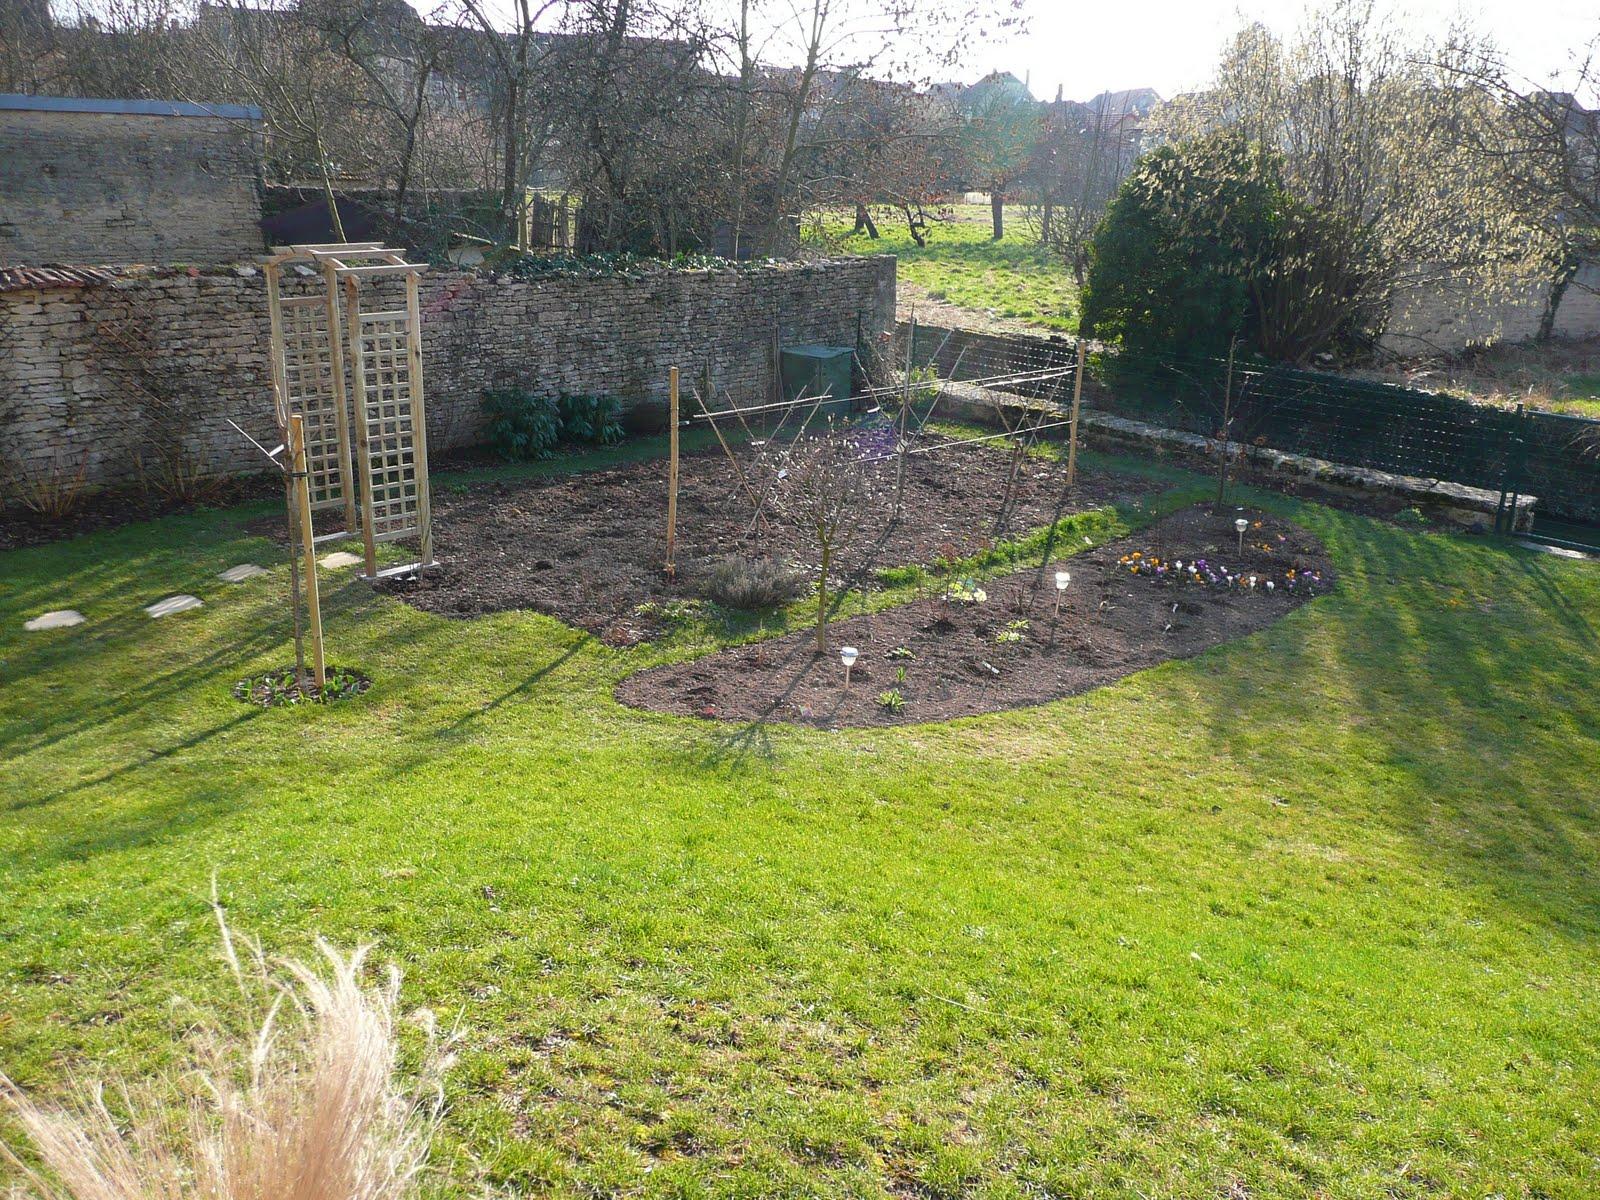 Notre jardin secret massif pinky winky avant apr s for Jardin 0 l4anglaise